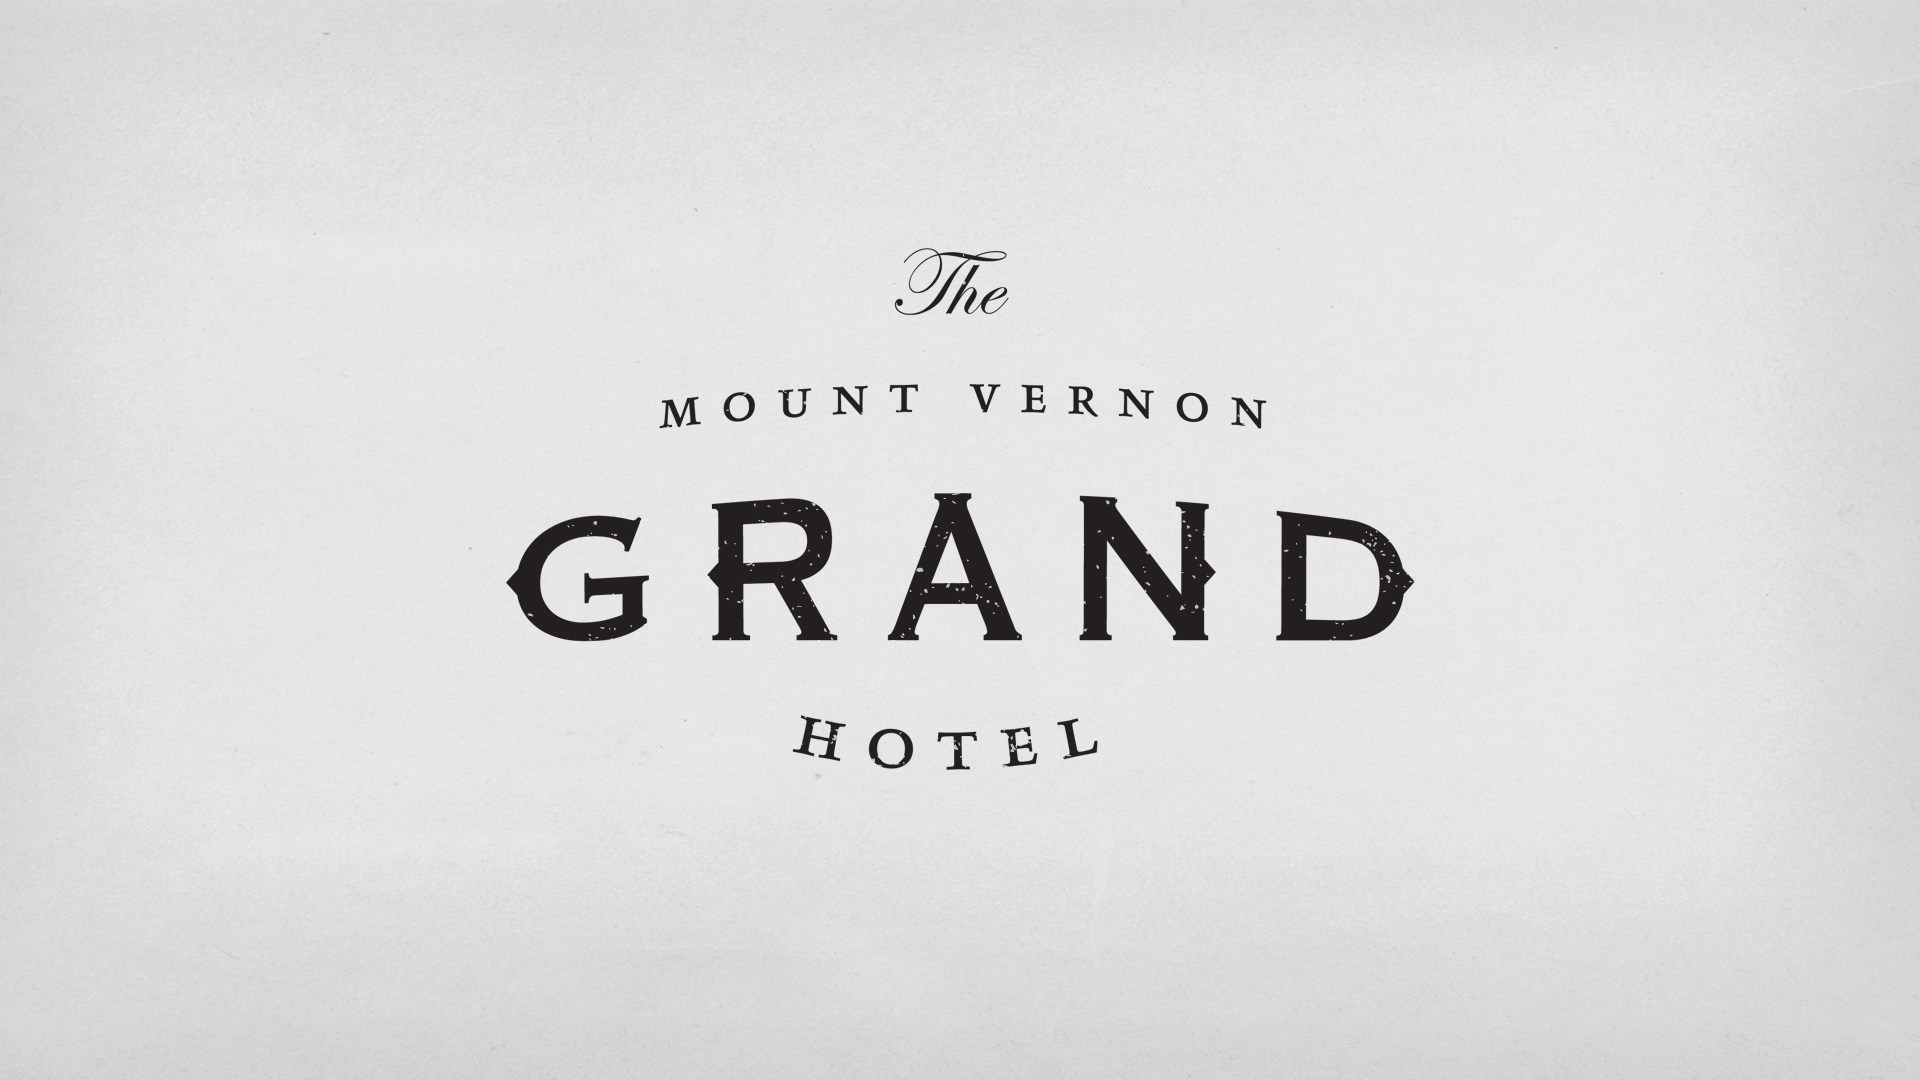 The Grand Hotel Logo designed by Arthur Cherry